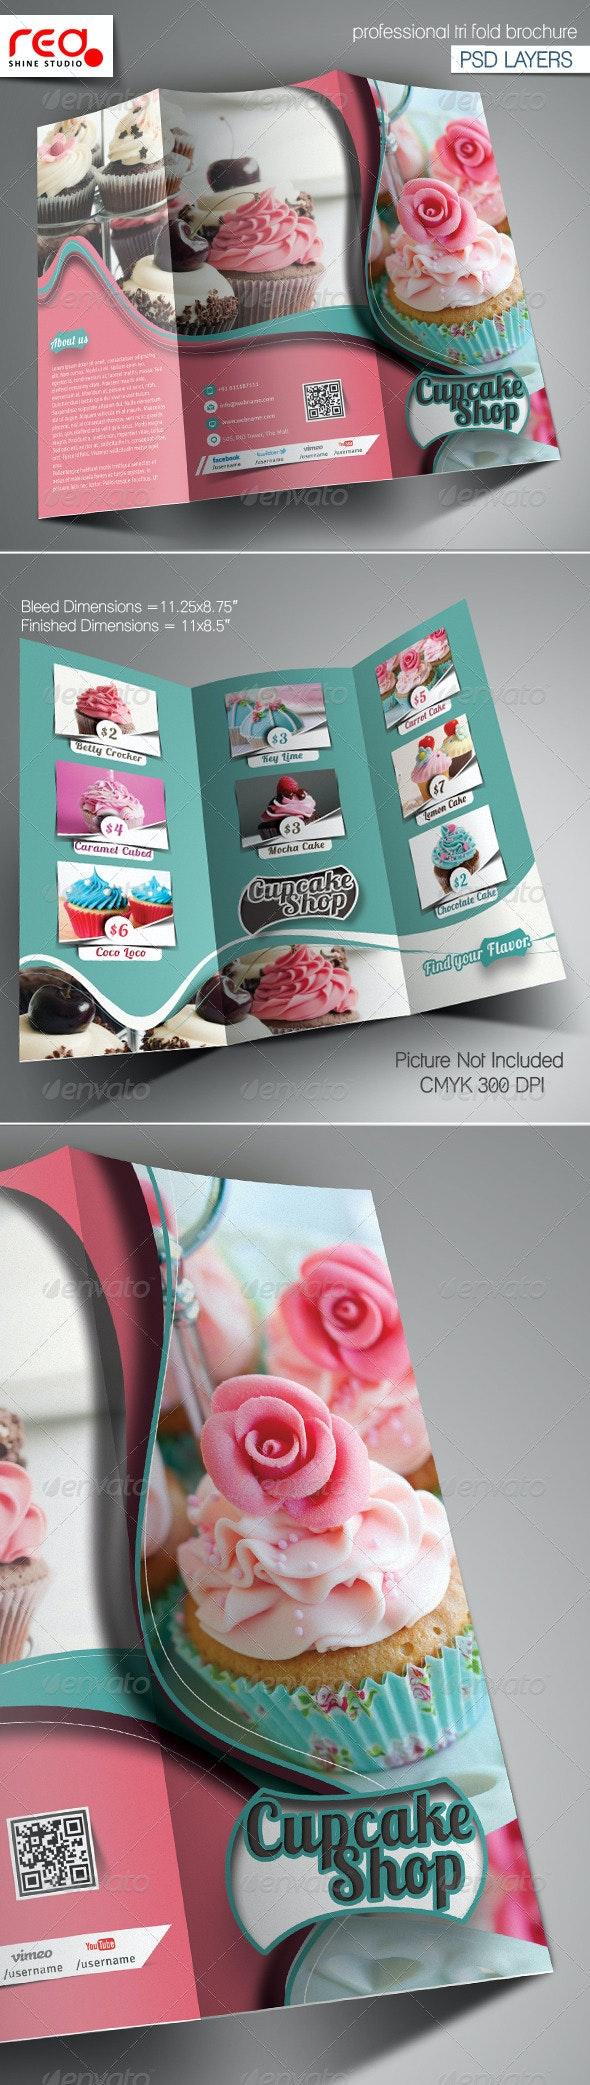 Cupcake & Bakery Shop Trifold Brochure Template - Catalogs Brochures